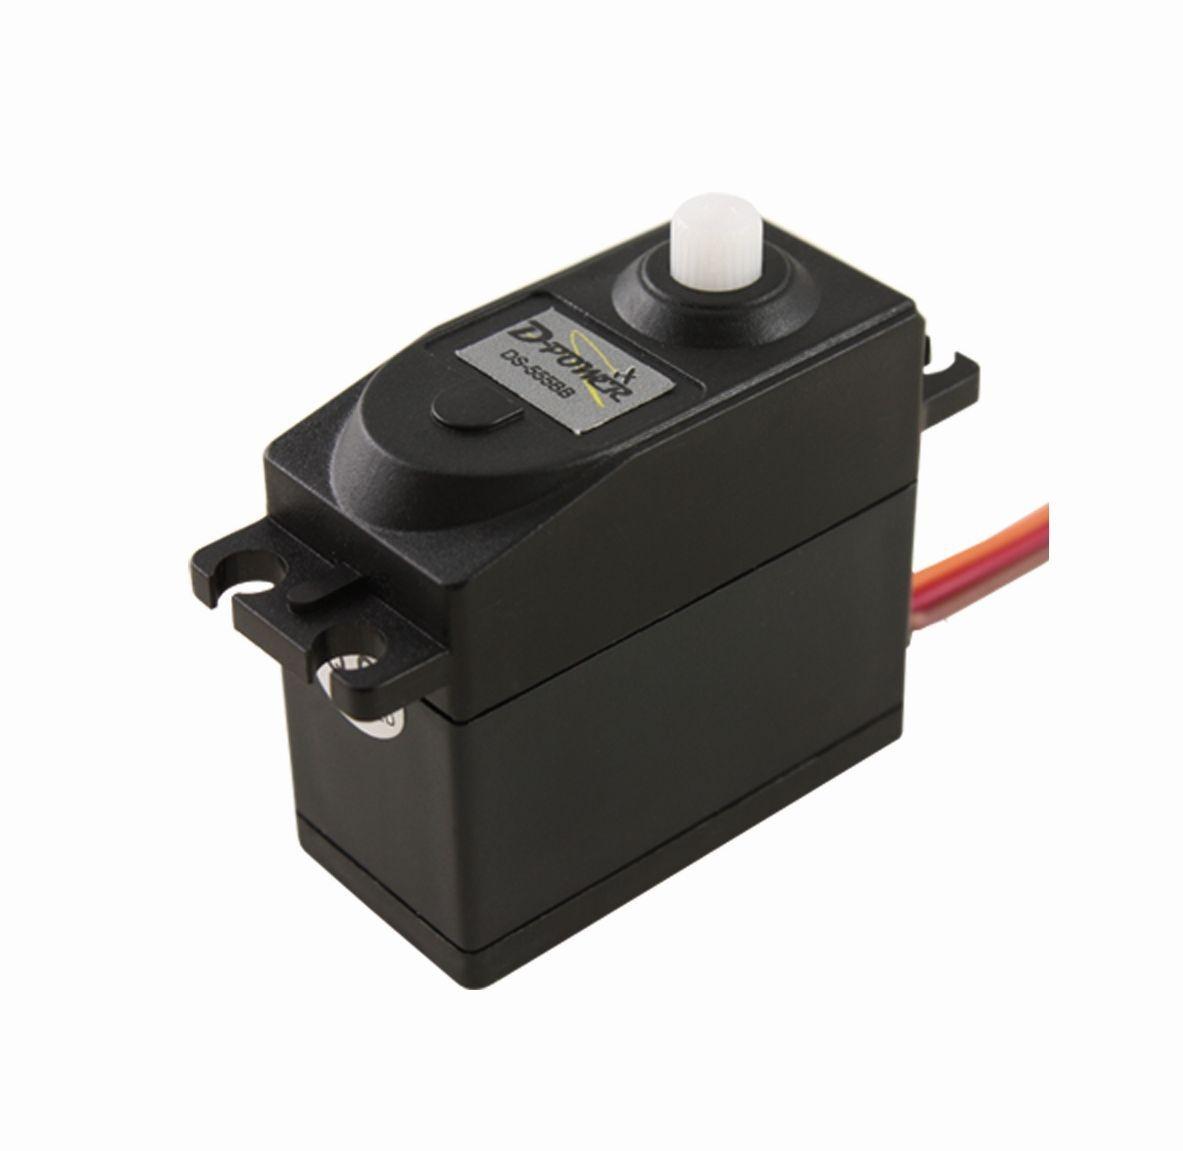 D-Power DS-555BB Digital-Servo